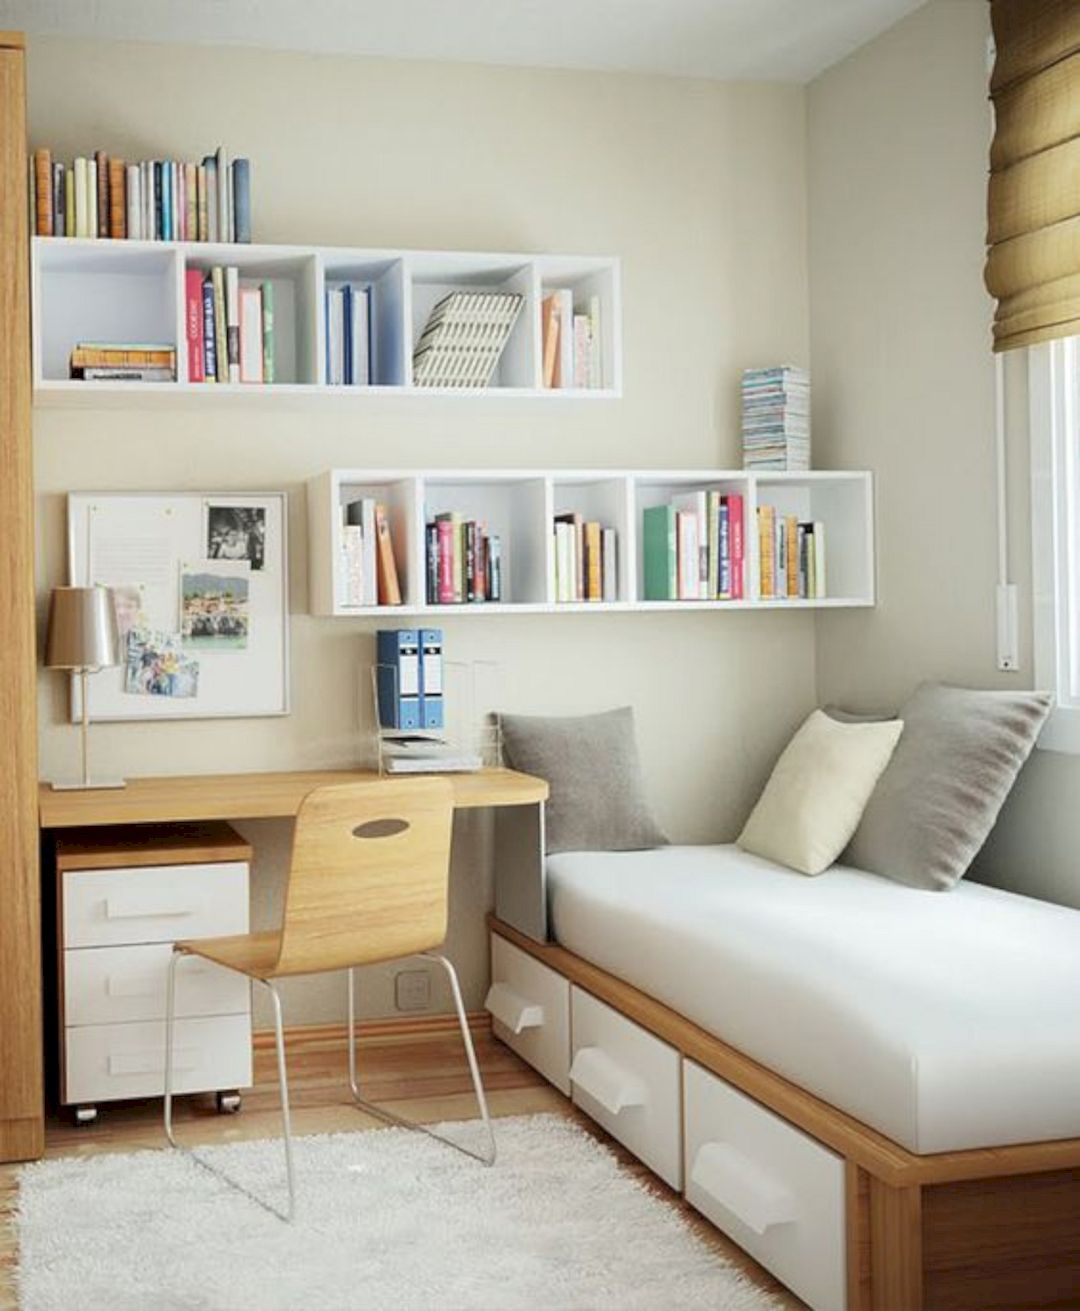 Small Crop Of Dorm Room Furniture Ideas